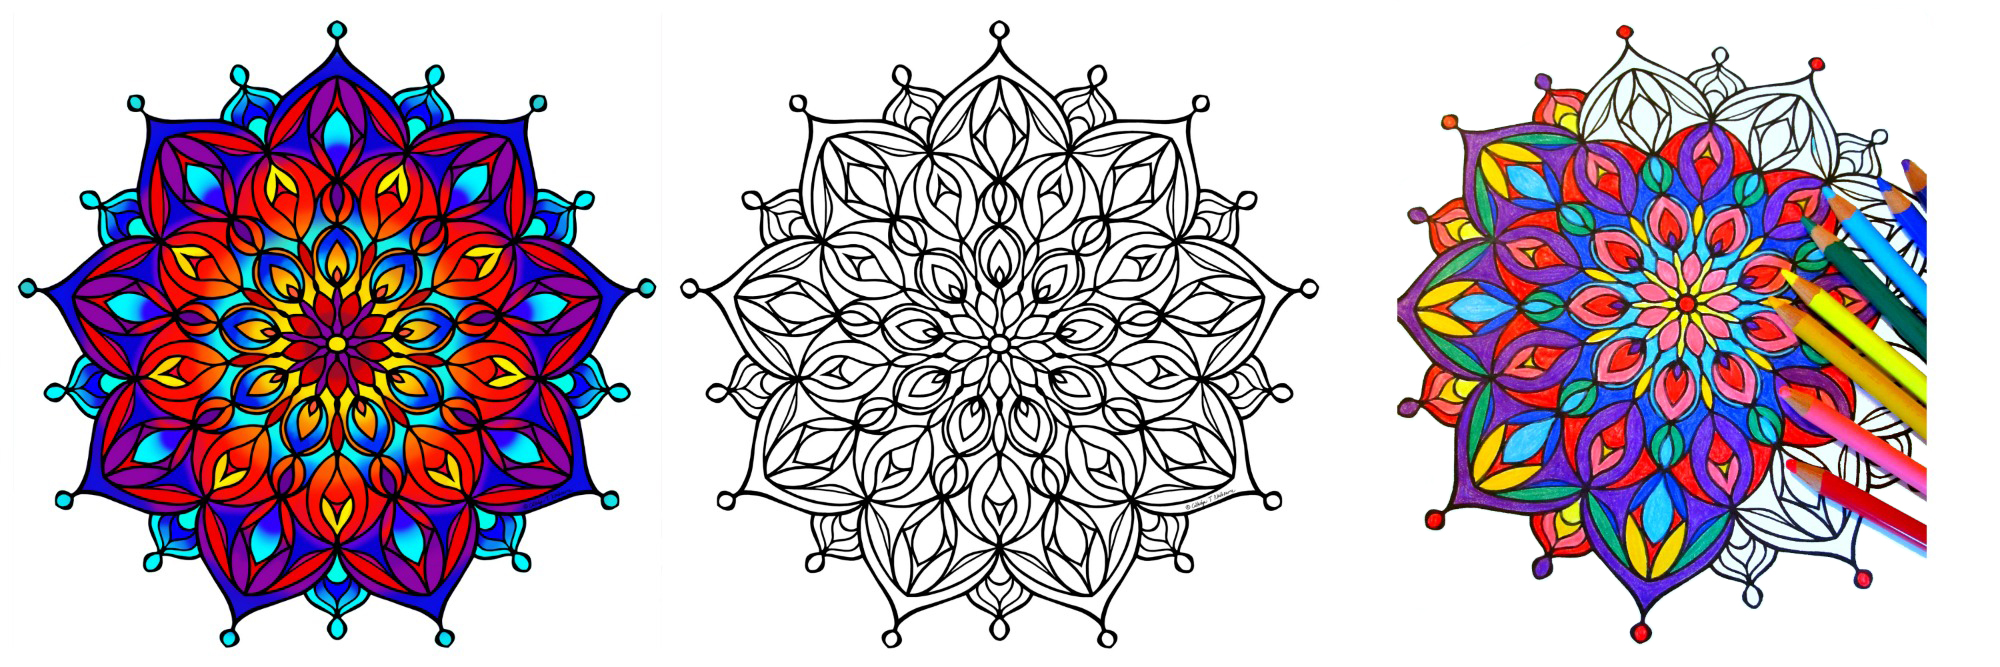 free-coloring-mandala-example-1